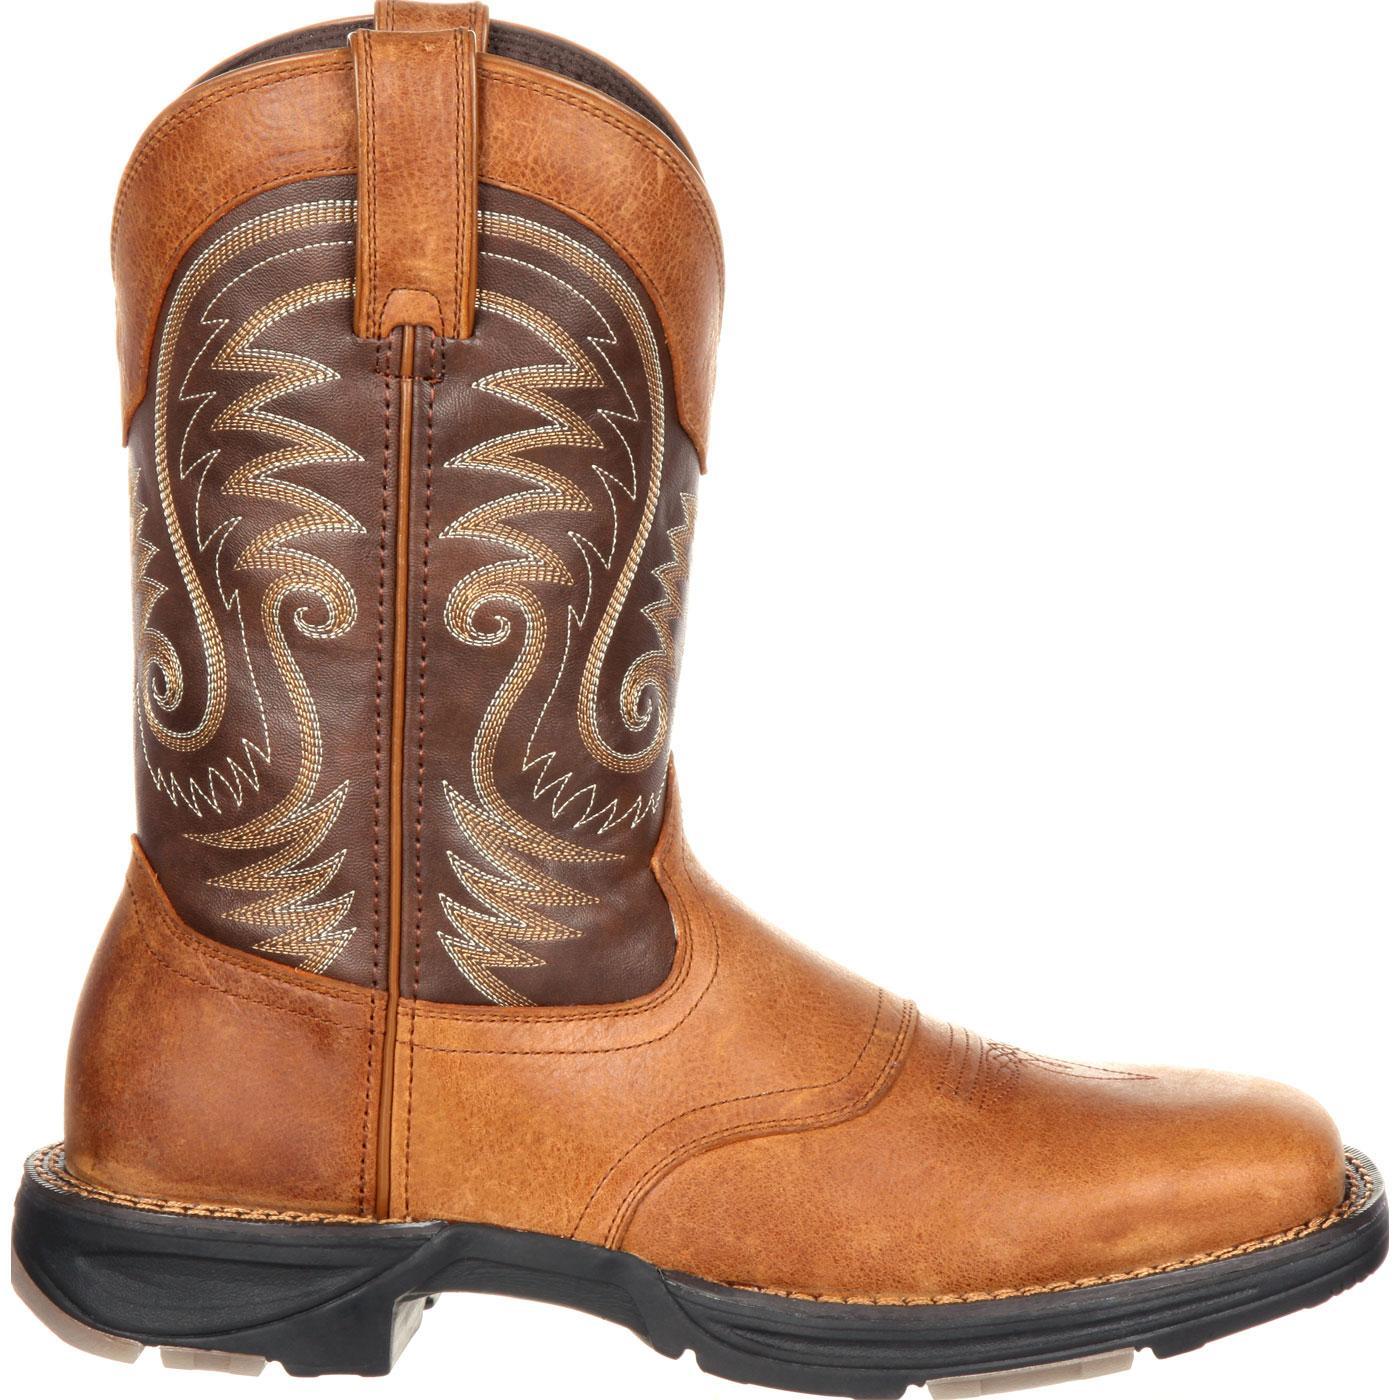 separation shoes 9eff5 5e932 Durango® Ultra-Lite™ Western Saddle Boot